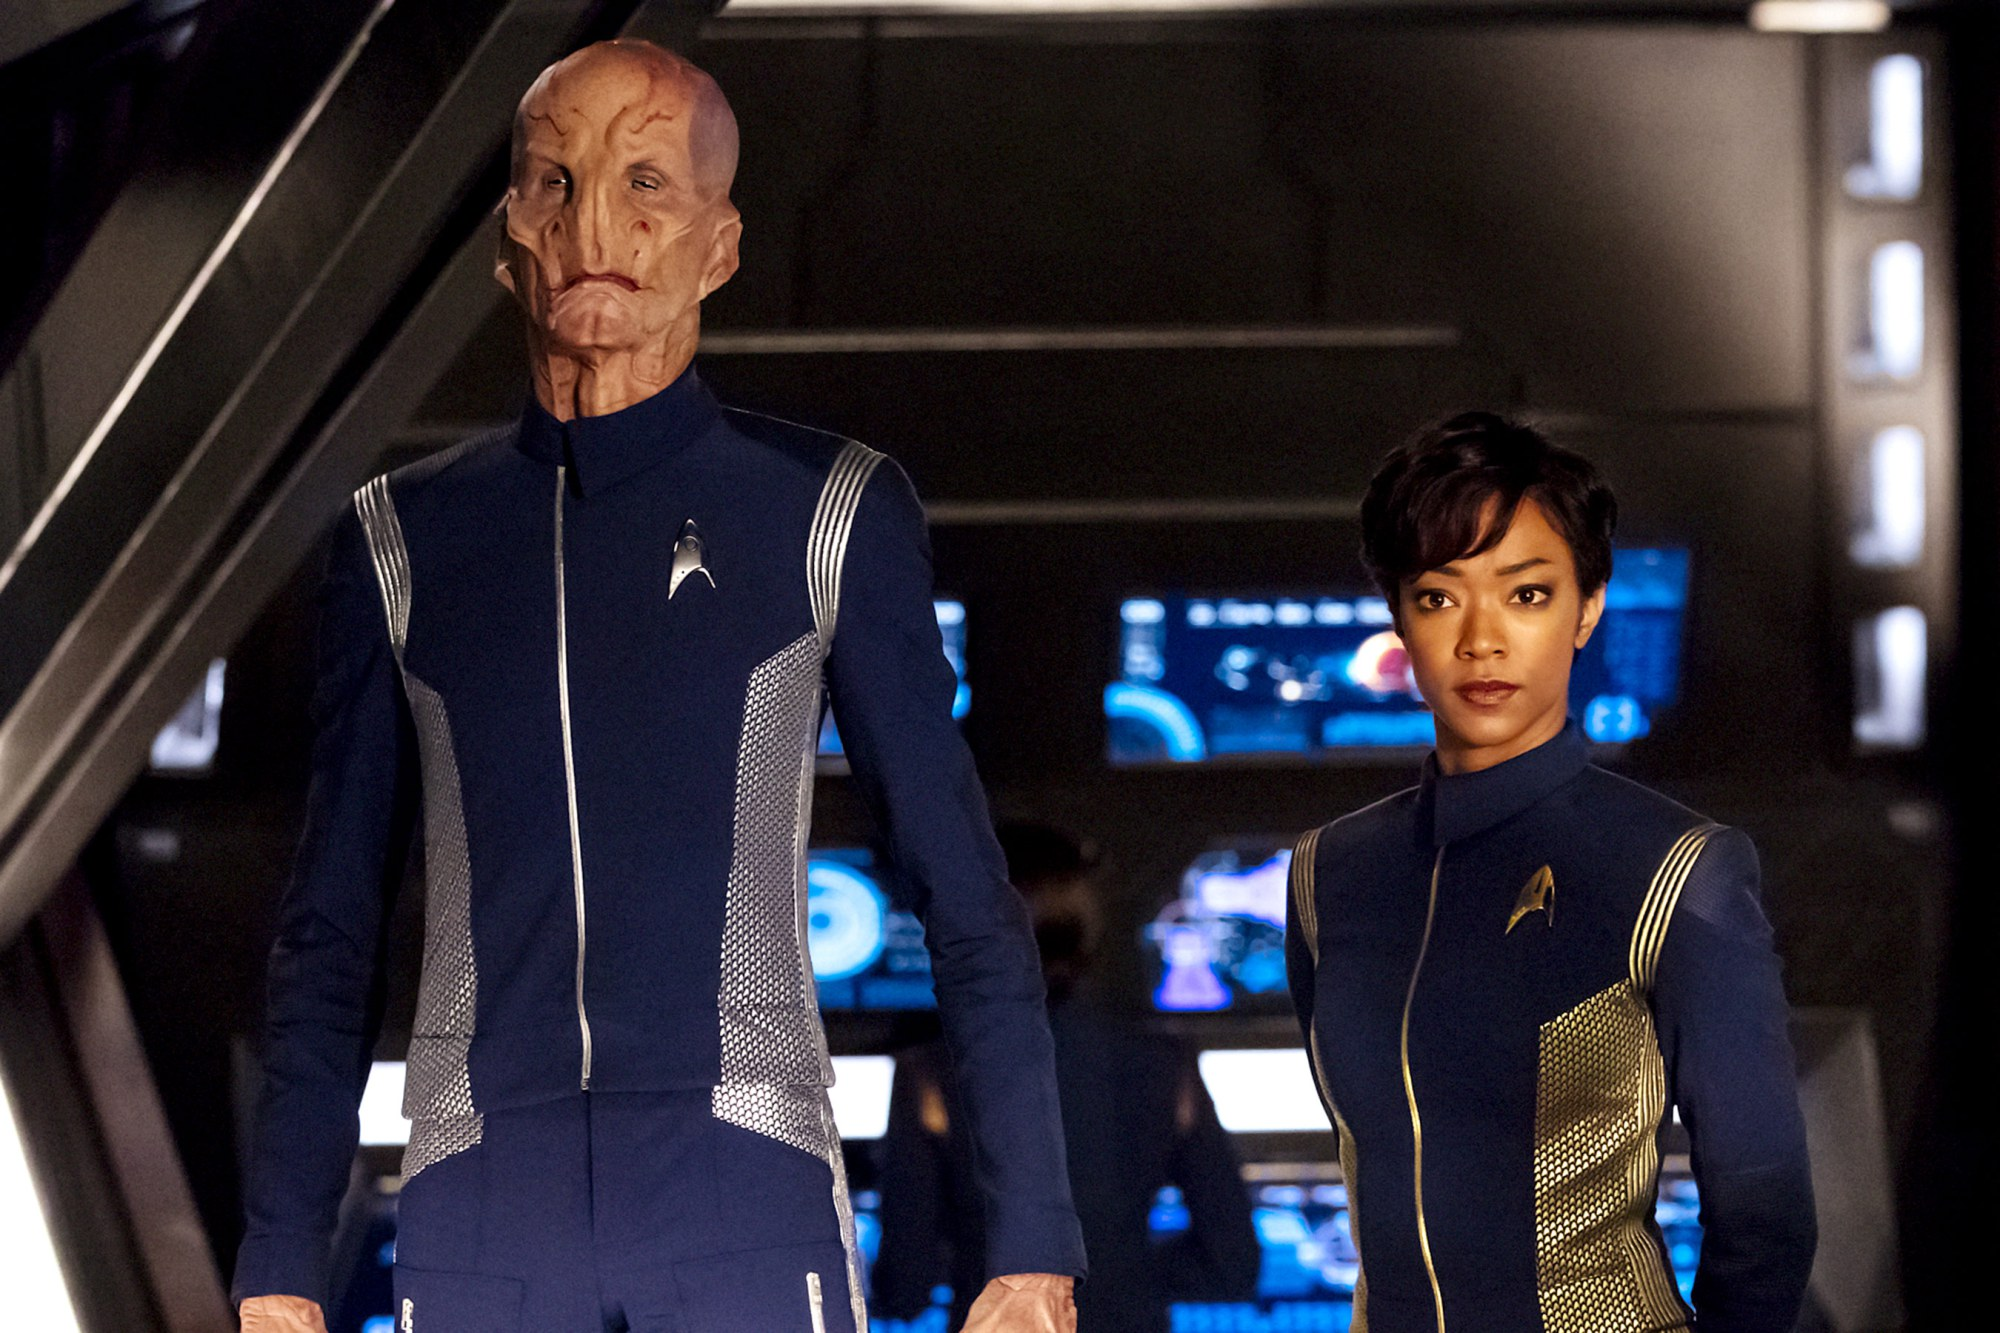 Doug Jones talks about playing an alien in Star Trek: Discovery